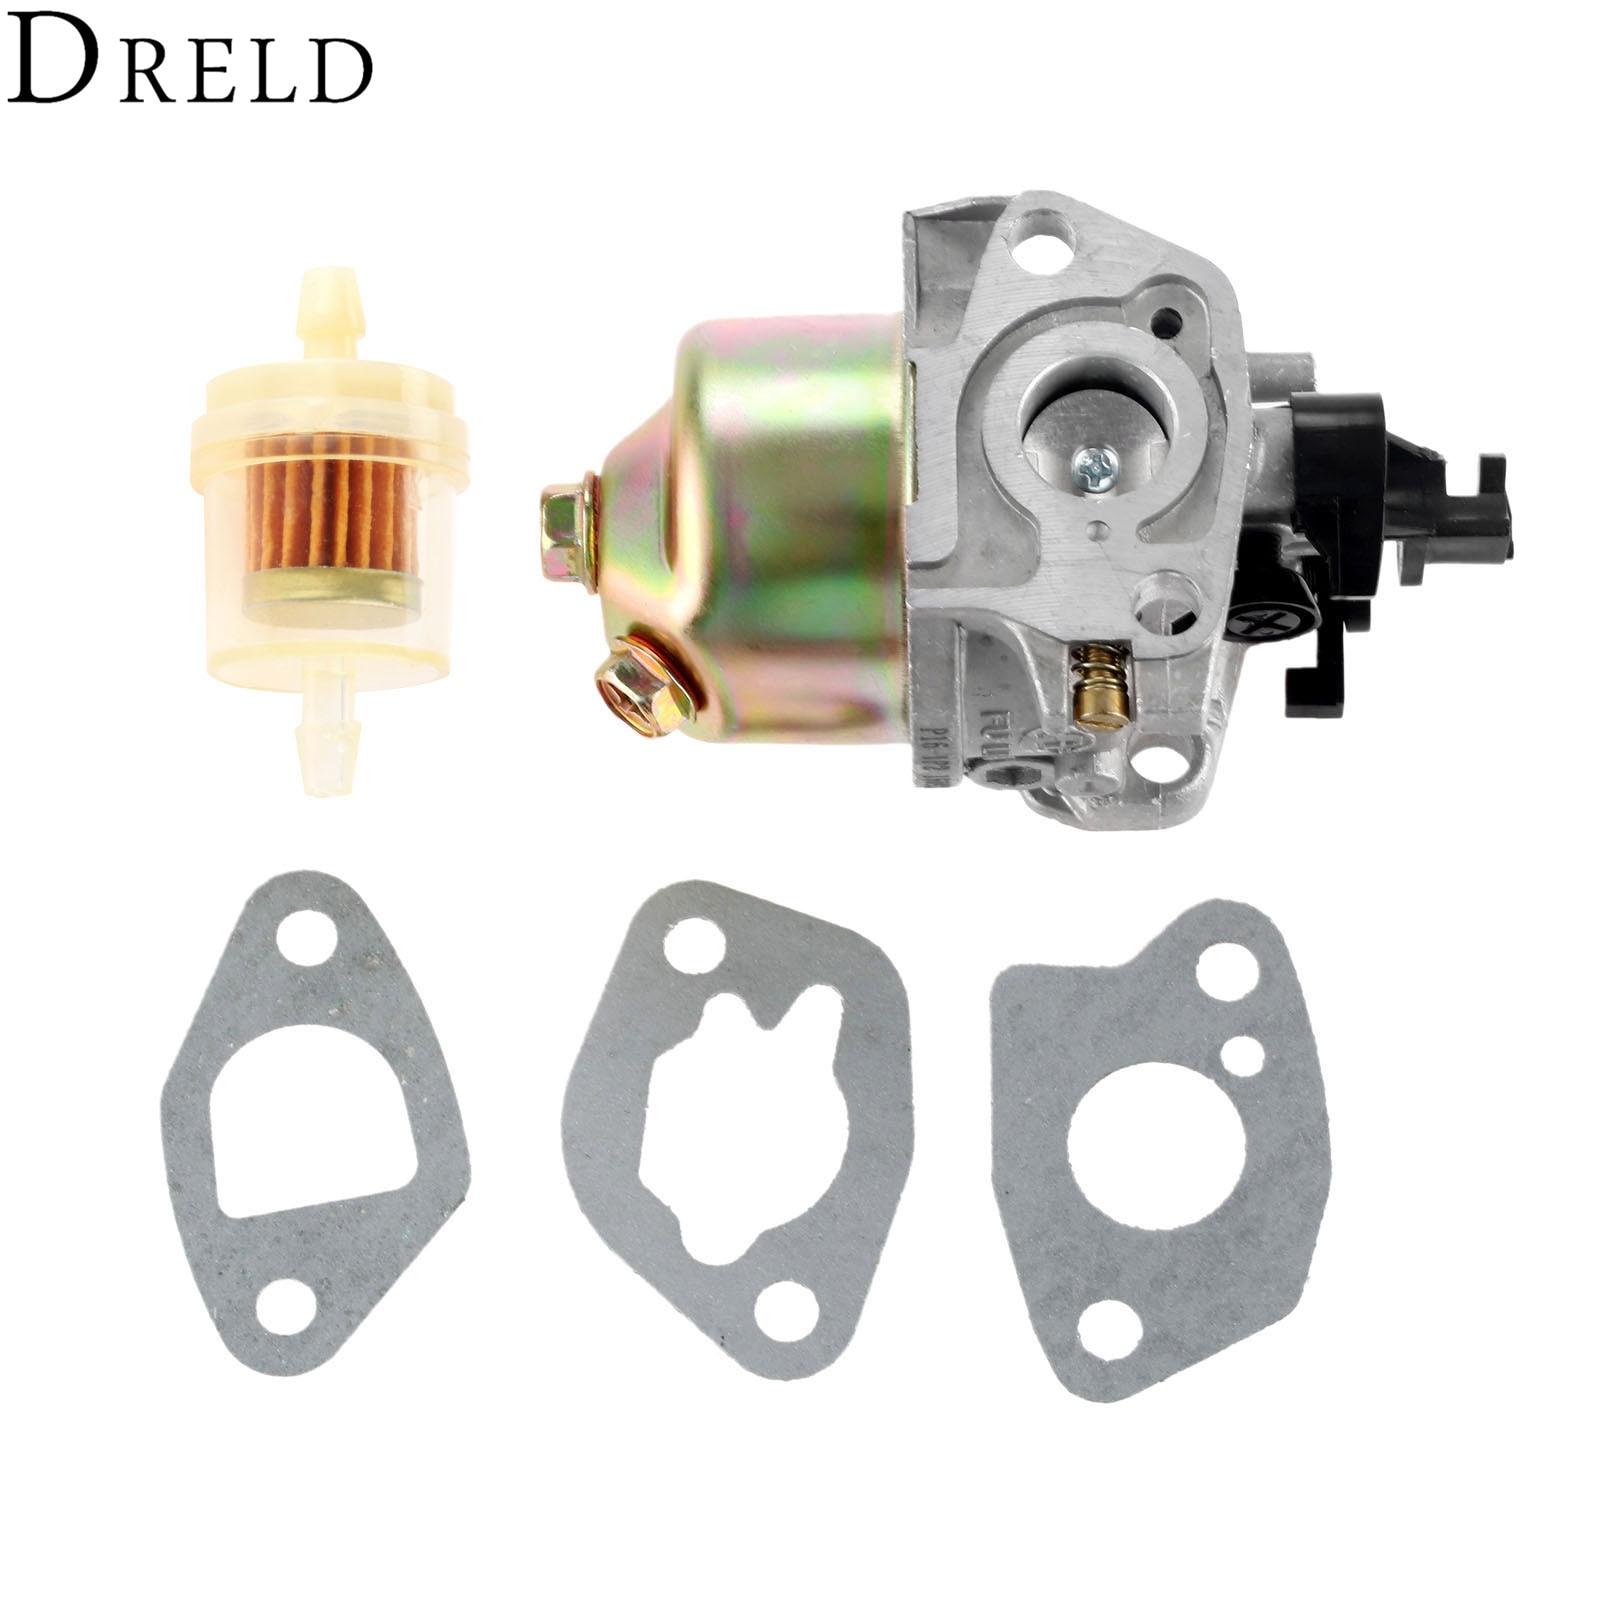 dreld carburetor with carburetor gasket fuel filter for mtd cub cadet troy bilt lawn mower [ 1600 x 1600 Pixel ]